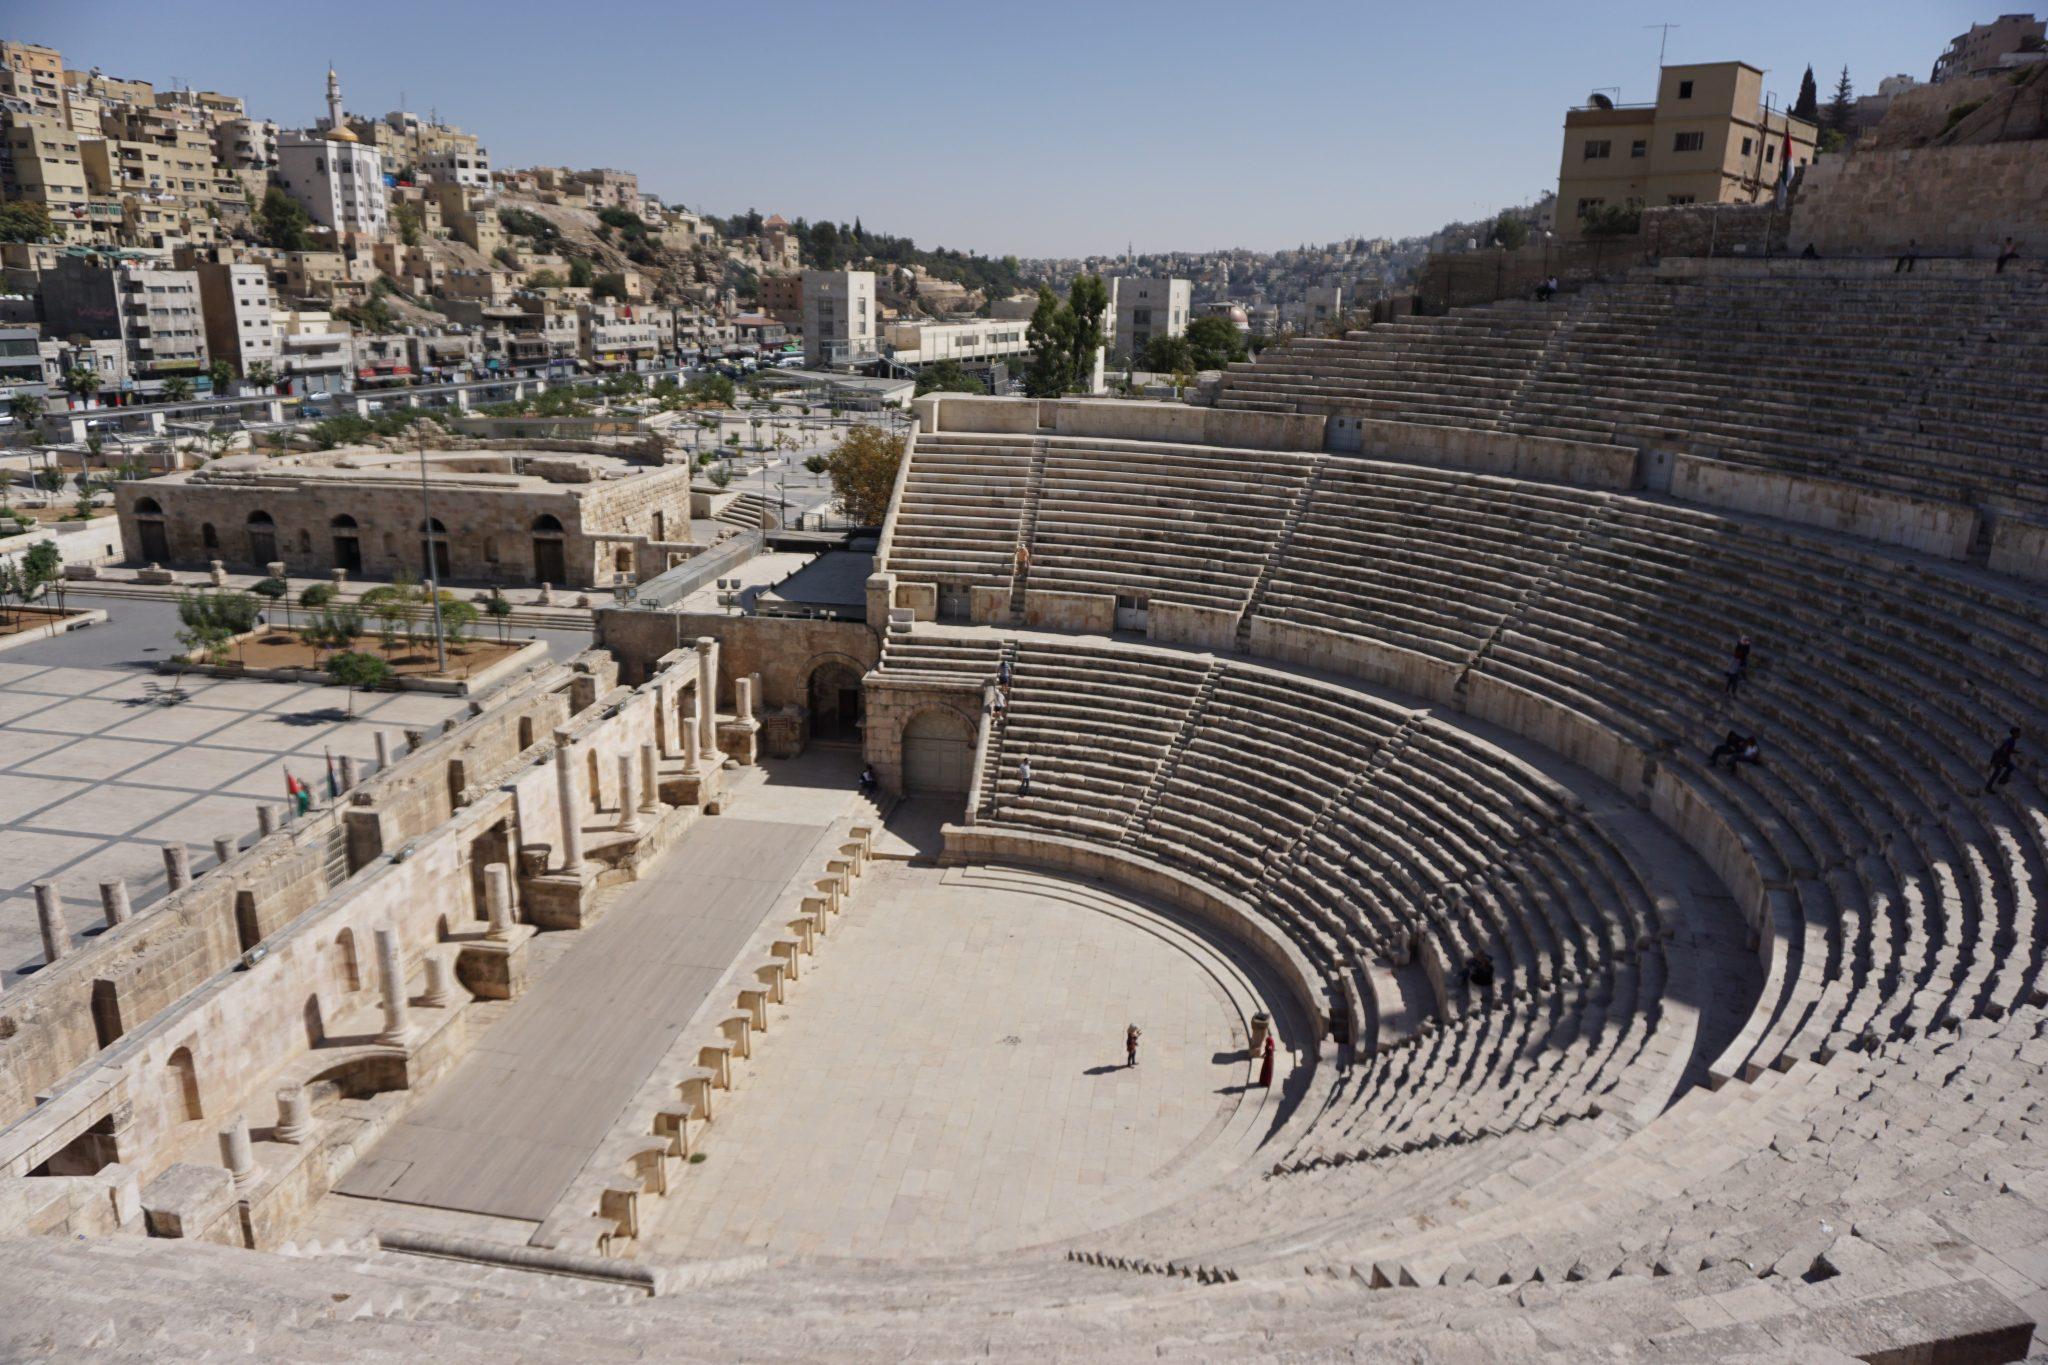 amphitheater, amman, jordan